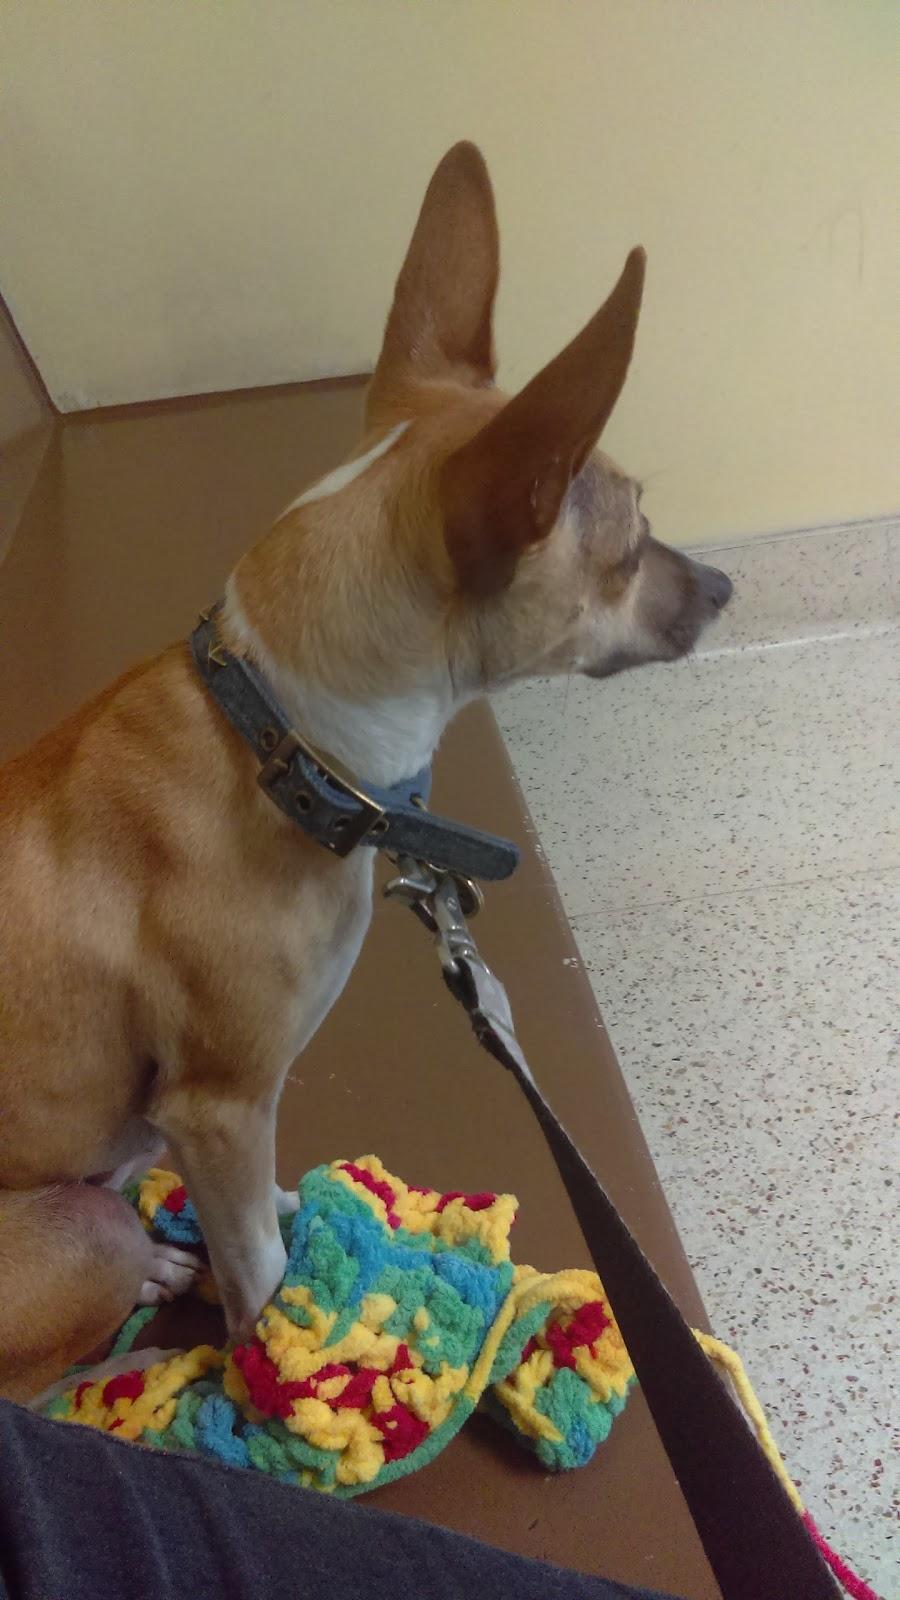 Golden State Humane Society - veterinary care  | Photo 10 of 10 | Address: 555 E Artesia Blvd, Long Beach, CA 90805, USA | Phone: (562) 423-8406